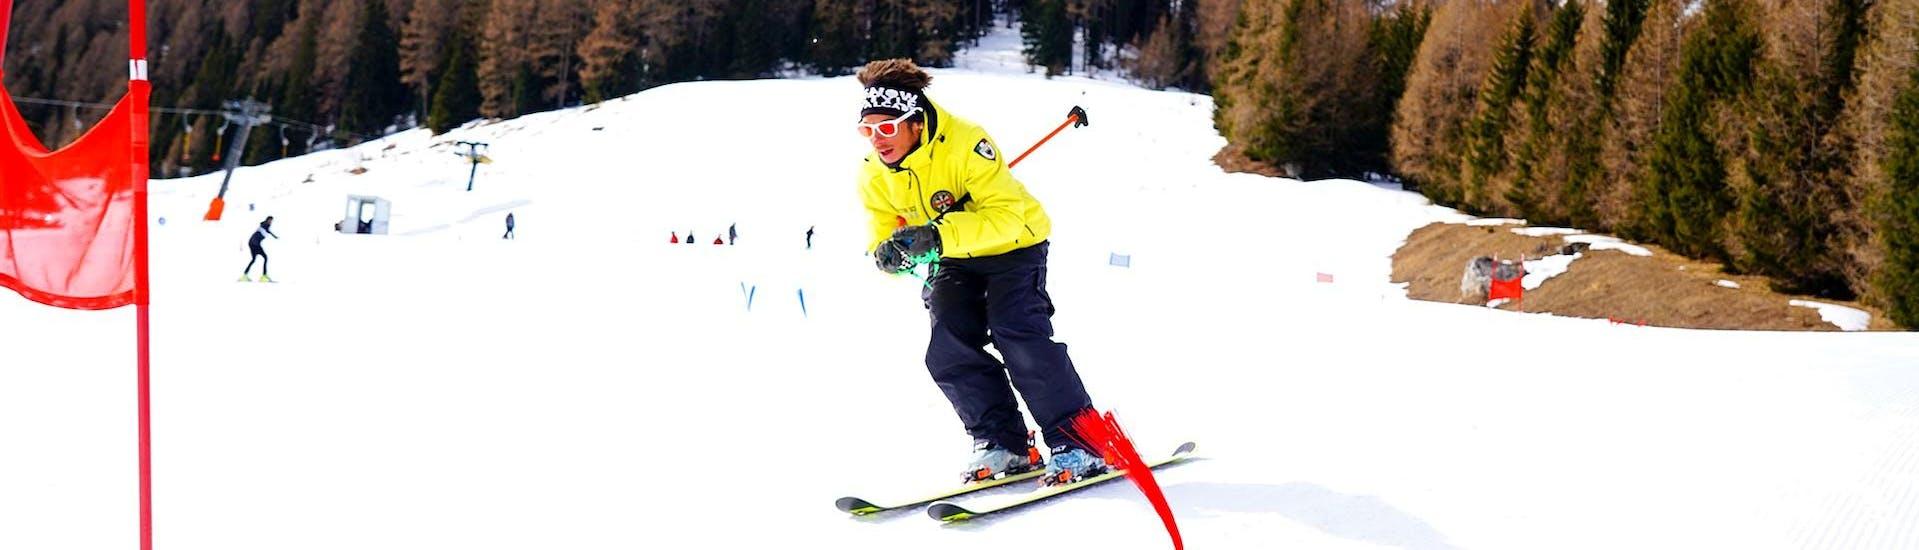 adult-ski-lessons-for-all-levels-maestri-di-sci-moena-hero